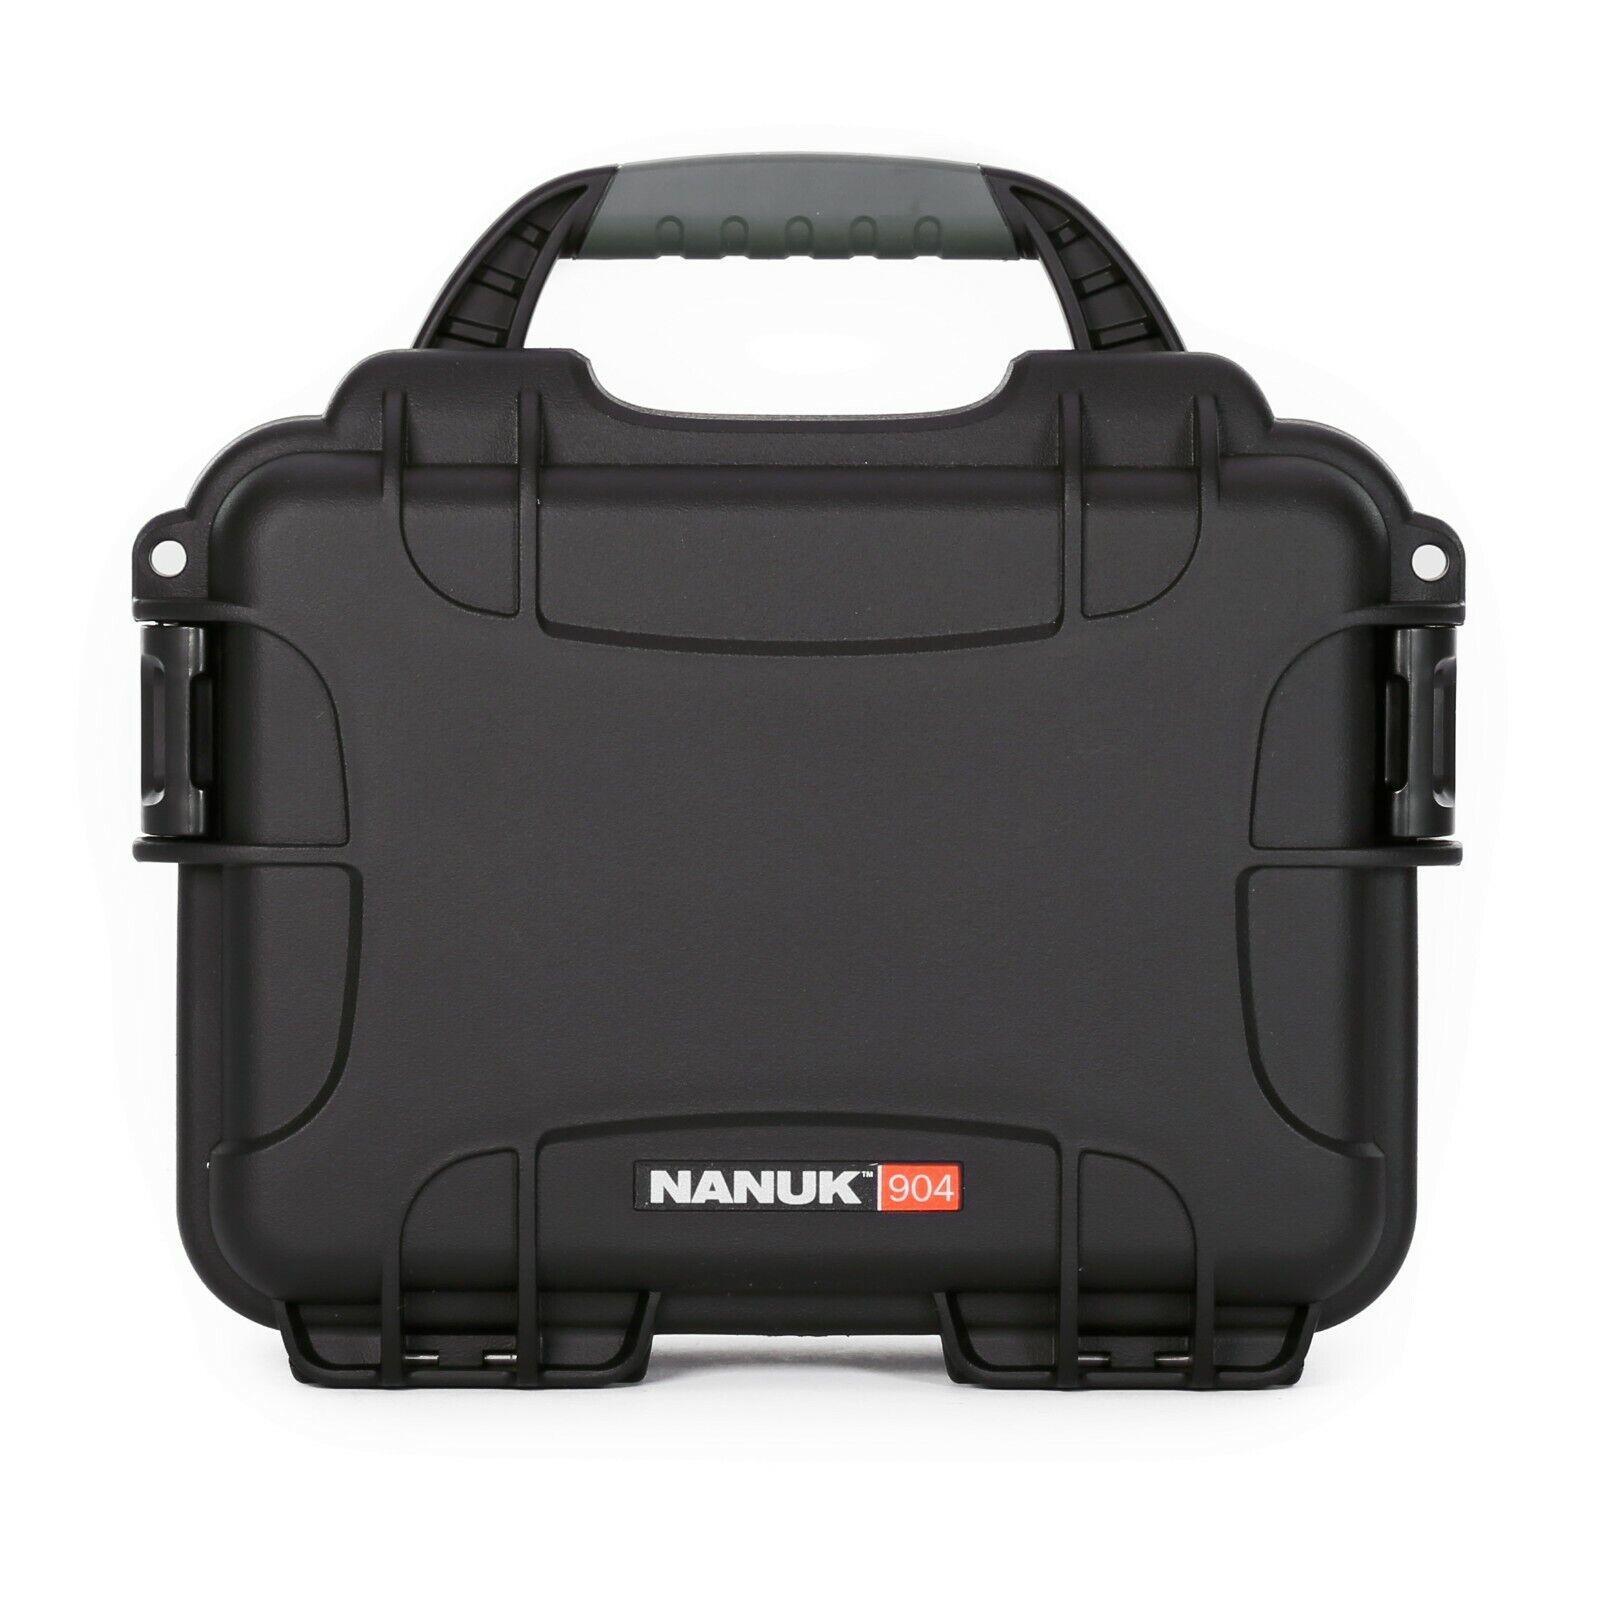 Nanuk case 904 NO FOAM.water proof,dust proof,impact resistant.NEW in original.